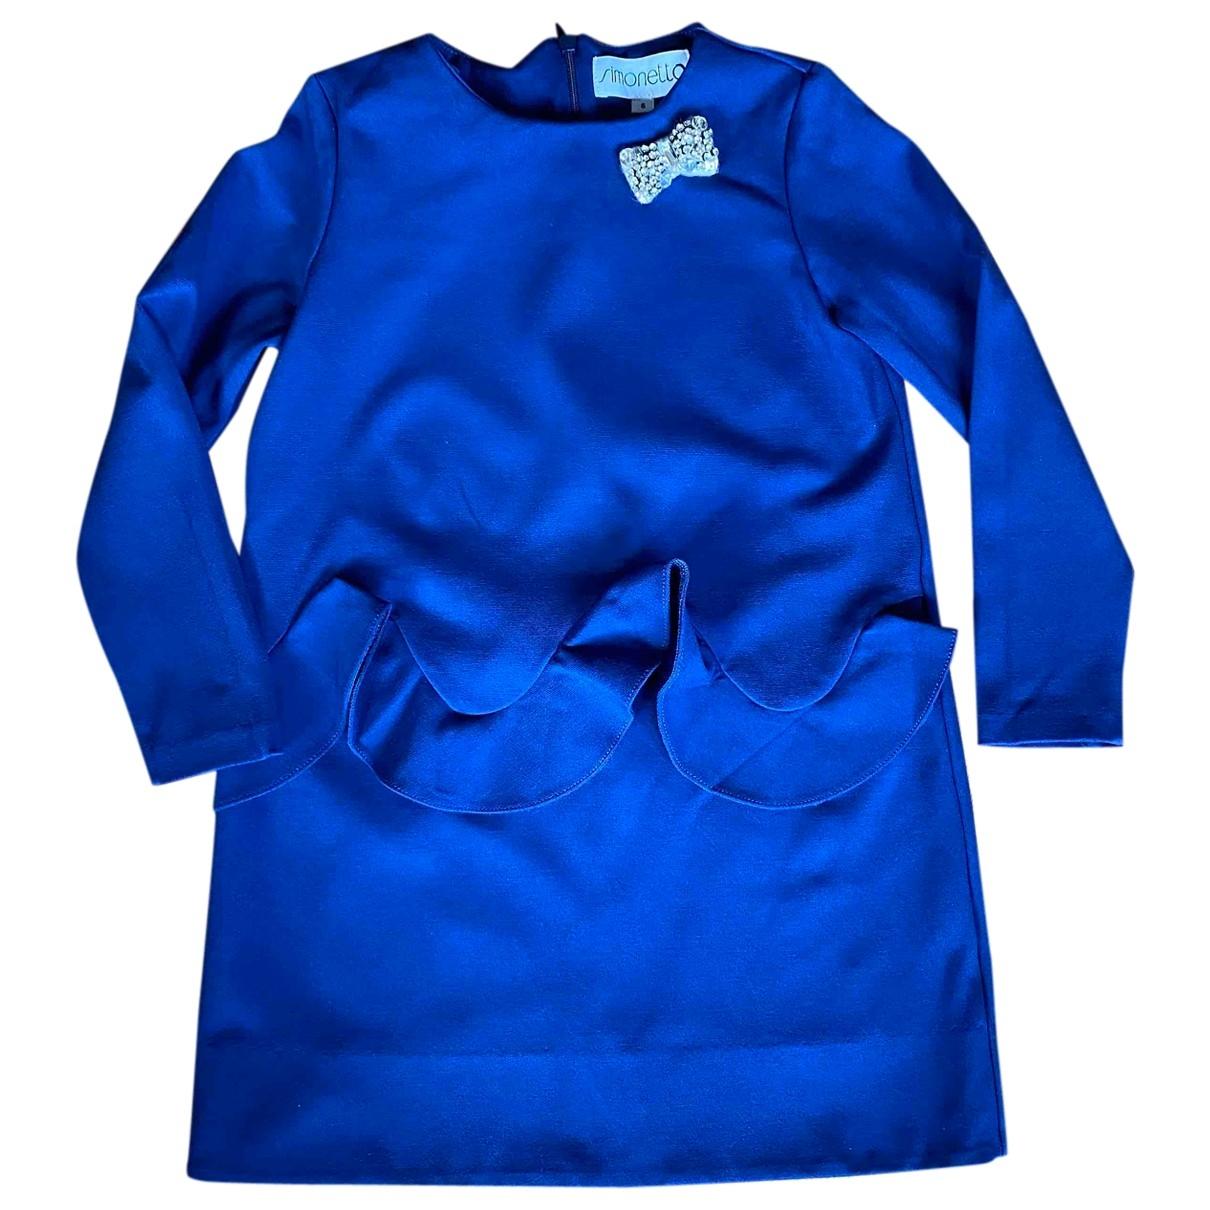 Simonetta \N Kleid in  Blau Viskose